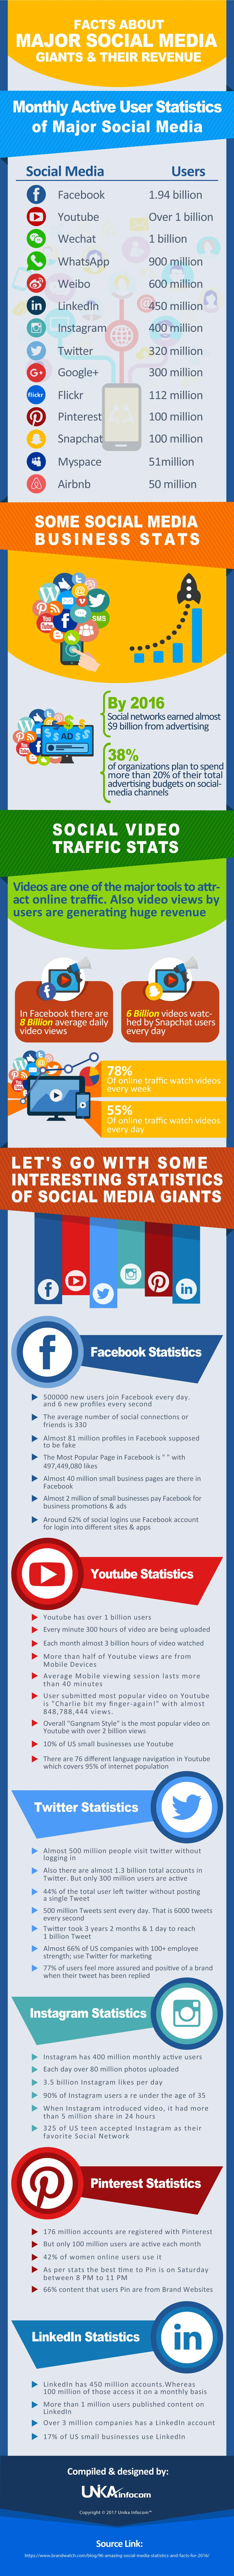 Social-Media-Giants-&-Their-Revenue